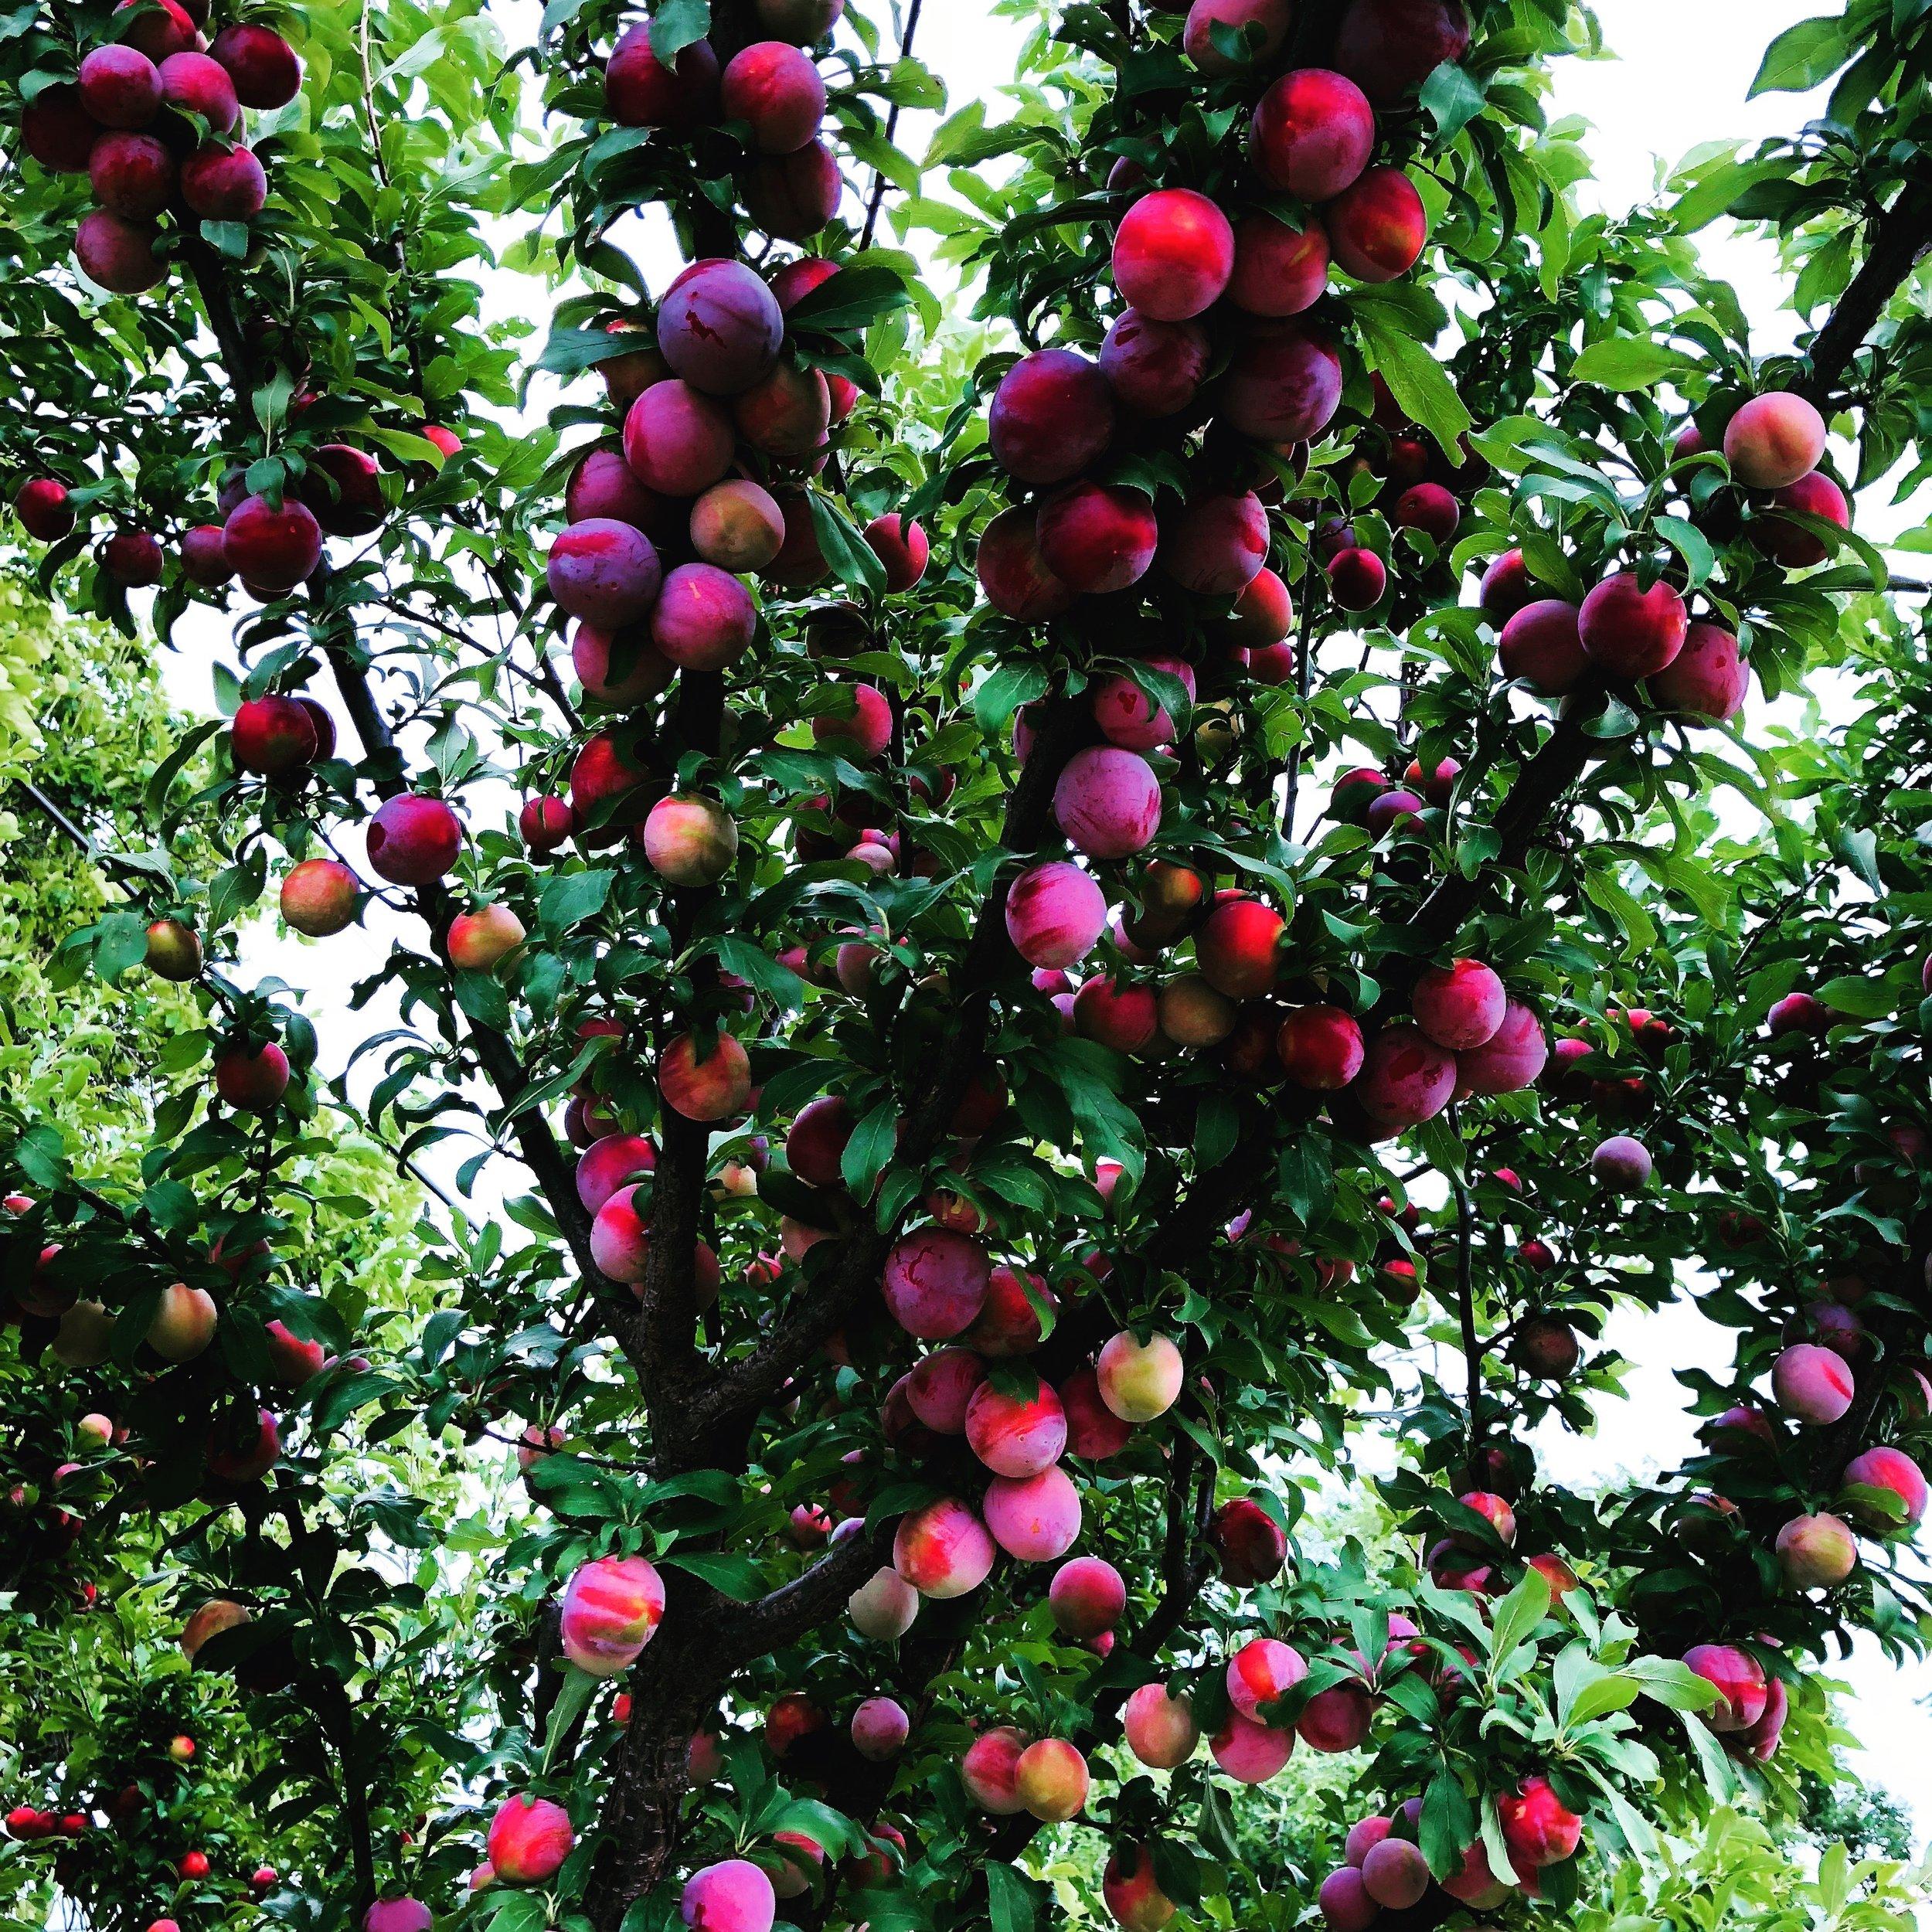 Garden plums ripening on the tree